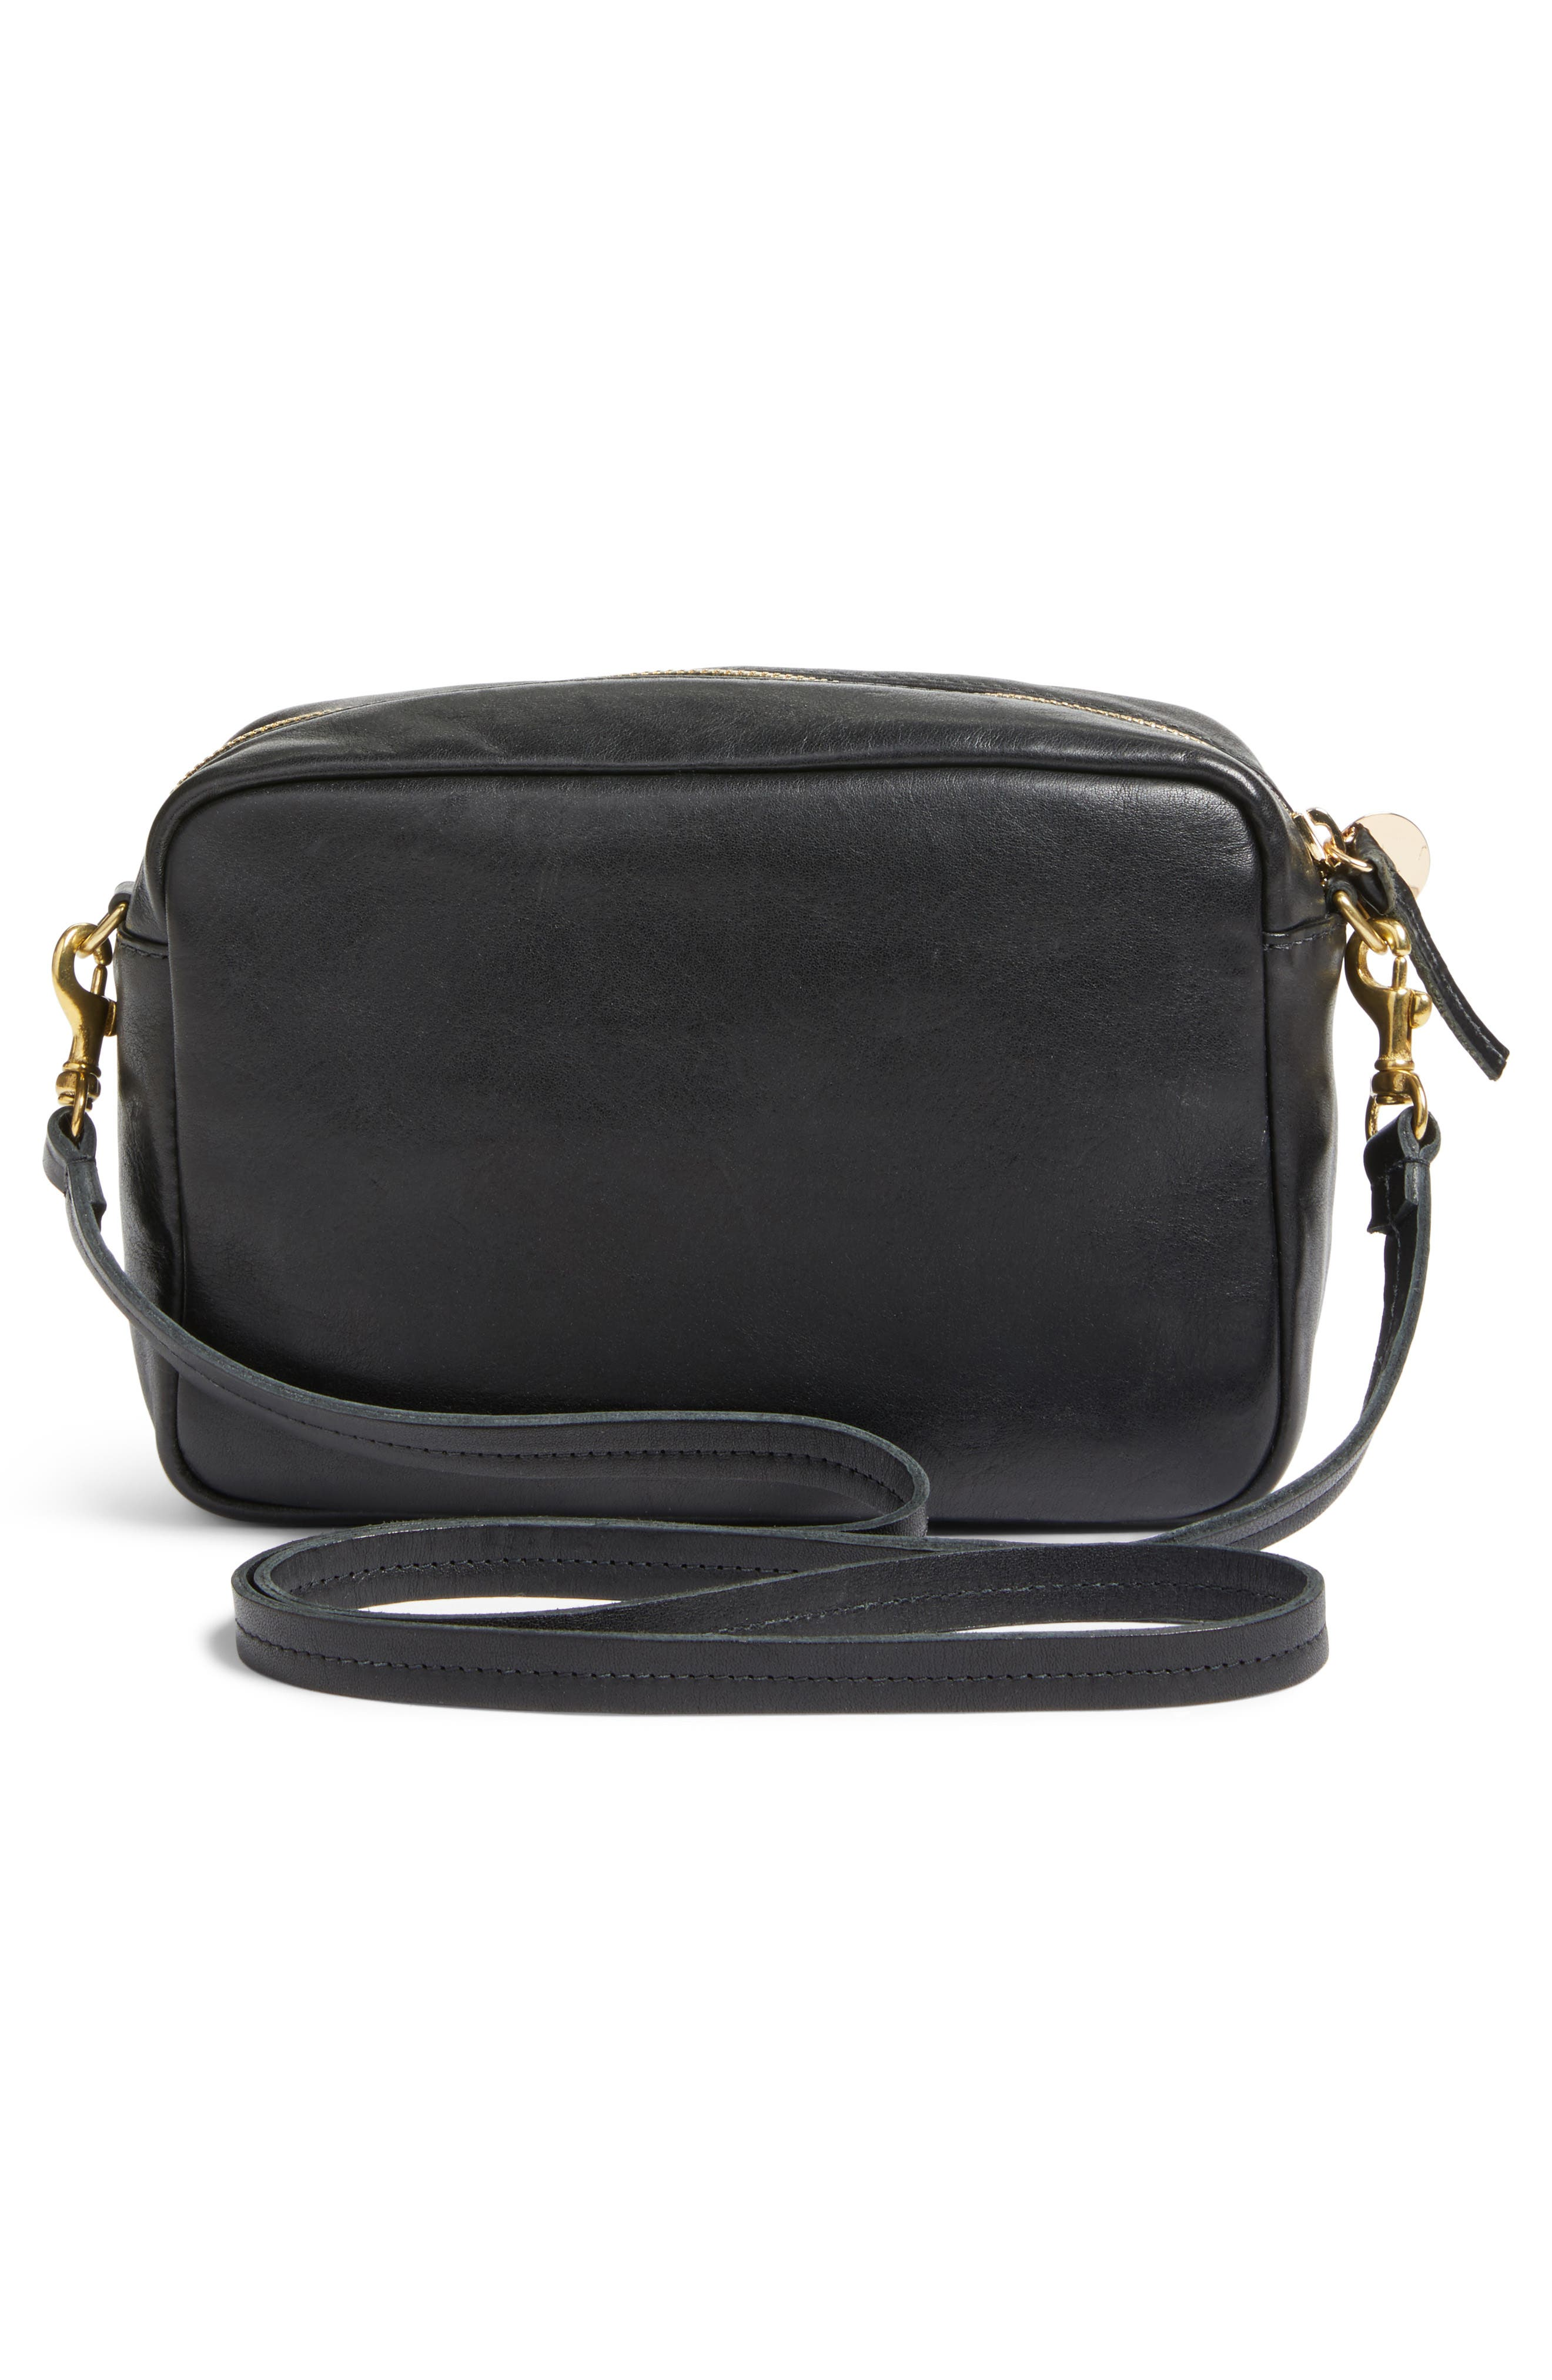 Midi Sac Leather & Genuine Calf Hair Shoulder Bag,                             Alternate thumbnail 3, color,                             Agave Leopard